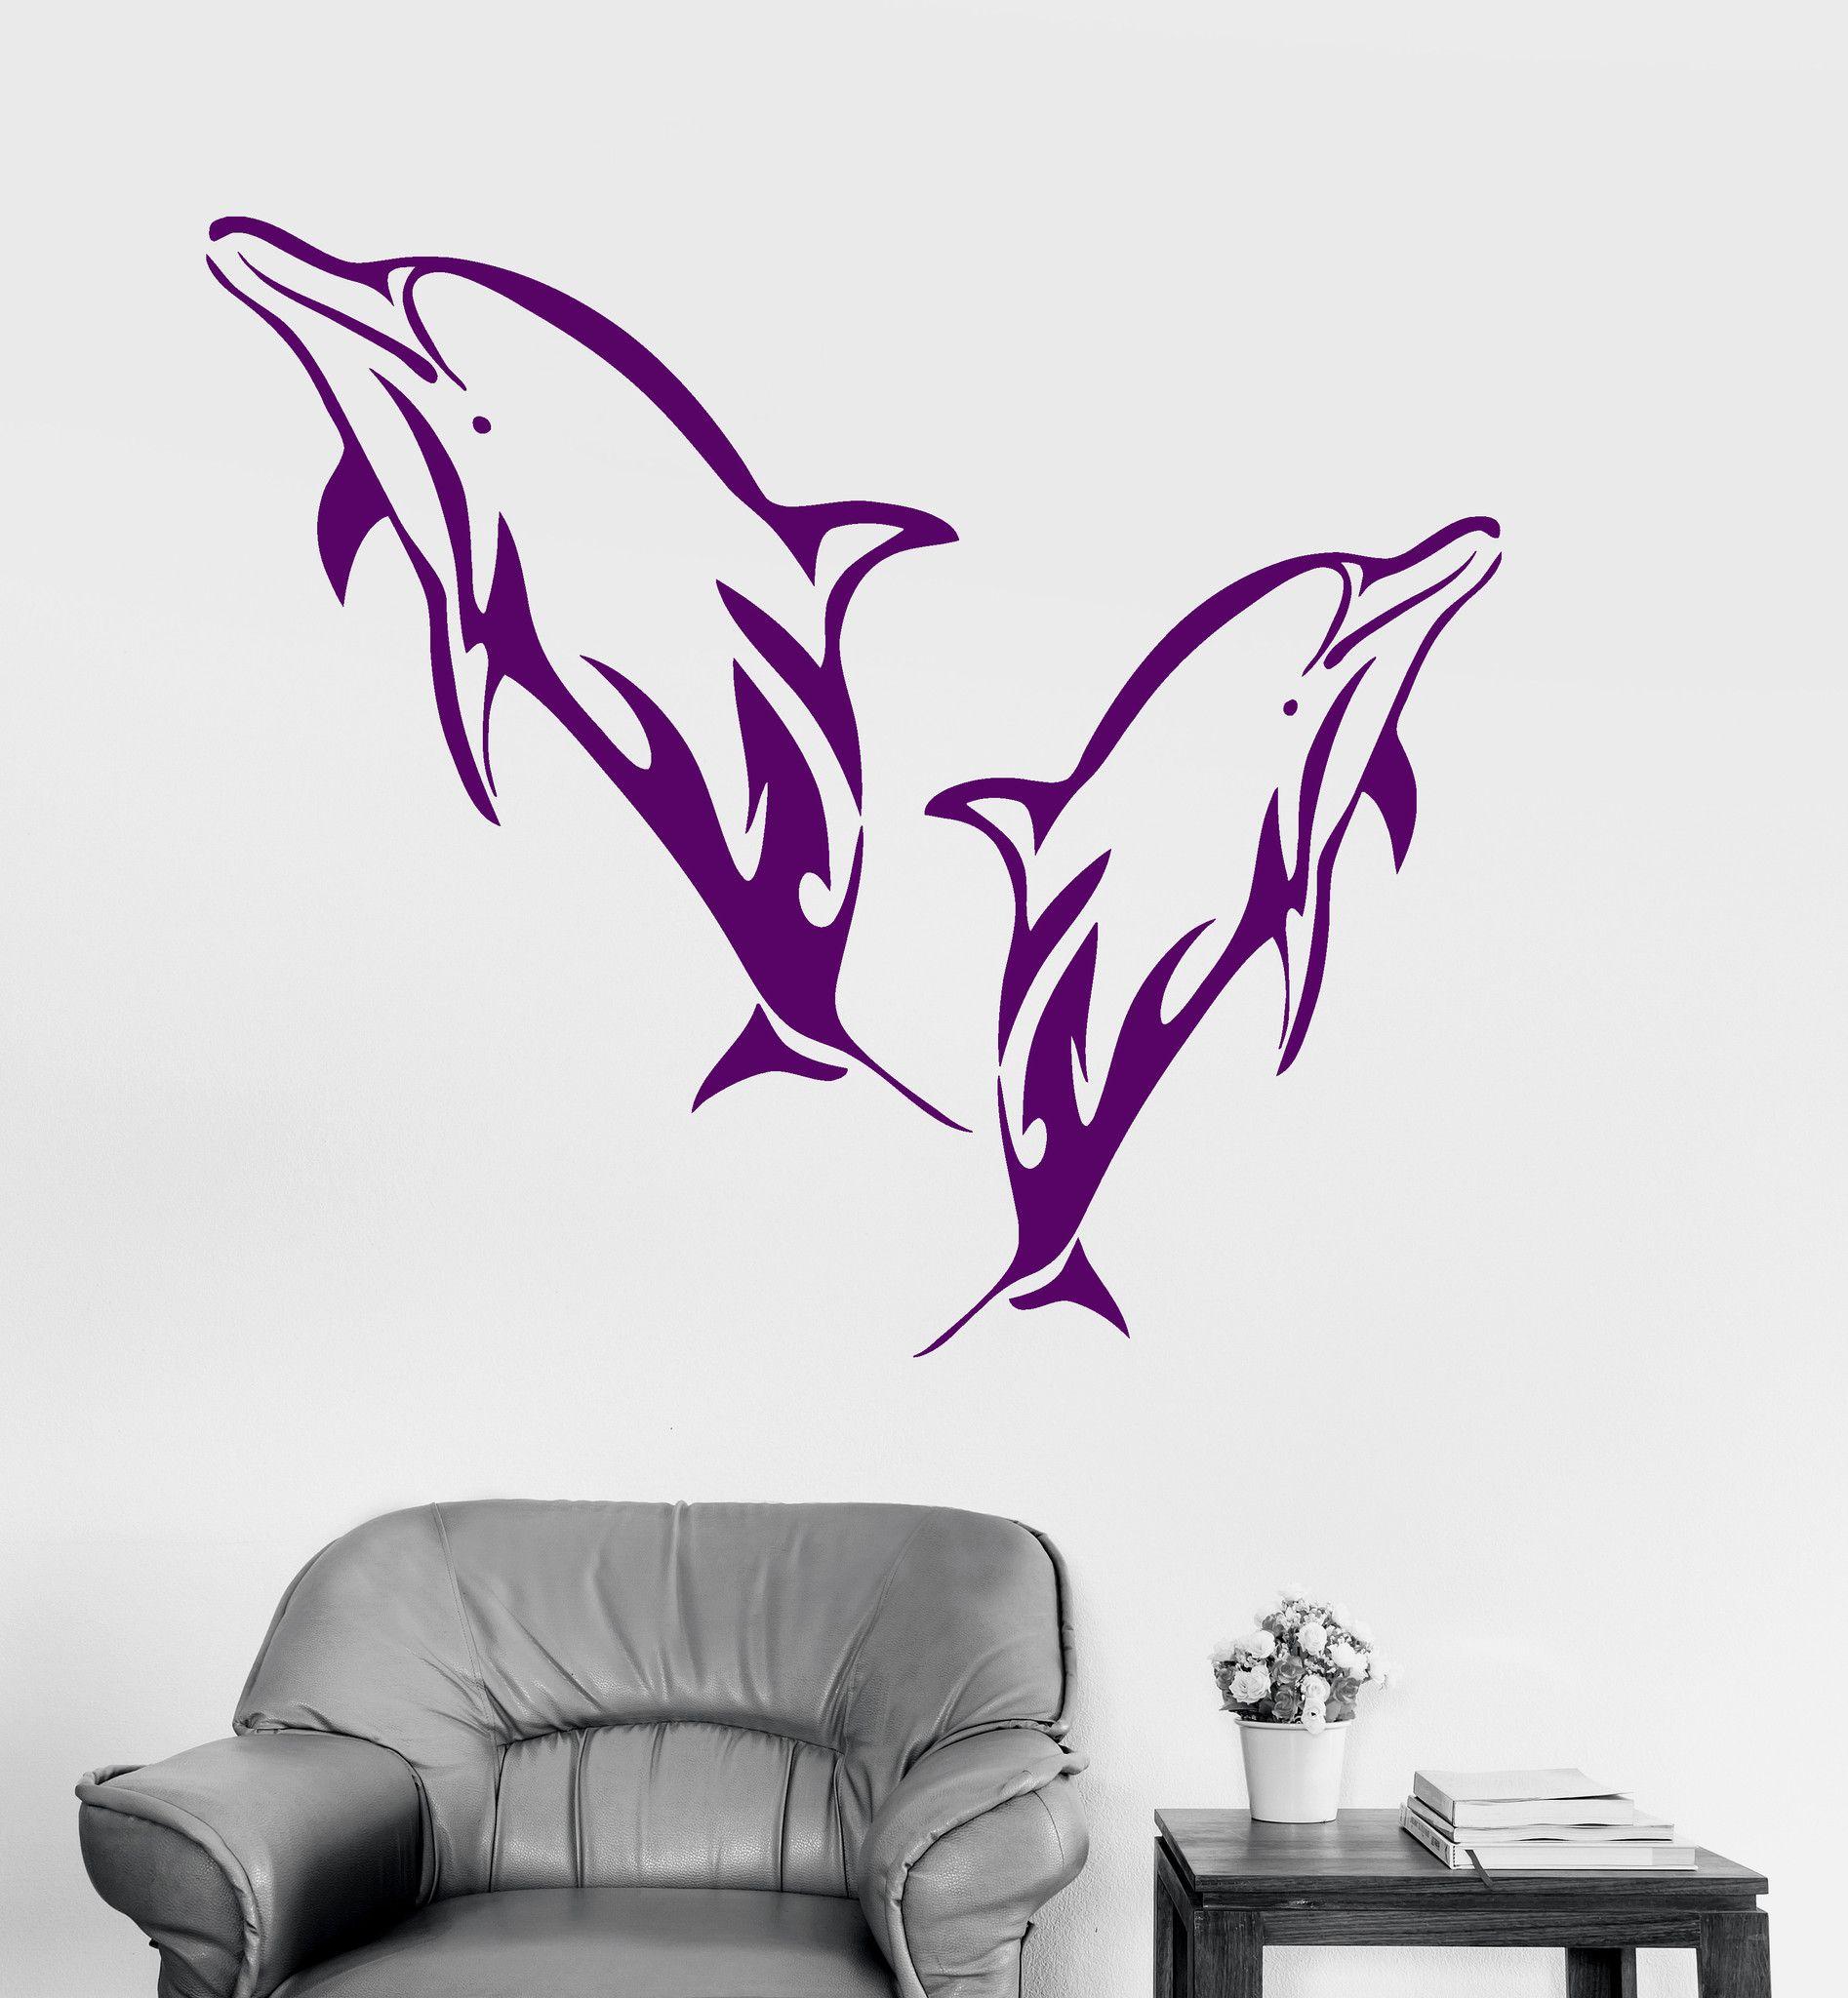 Vinyl Wall Decal Dolphins Marine Decor Bathroom Art Ocean Stickers ...